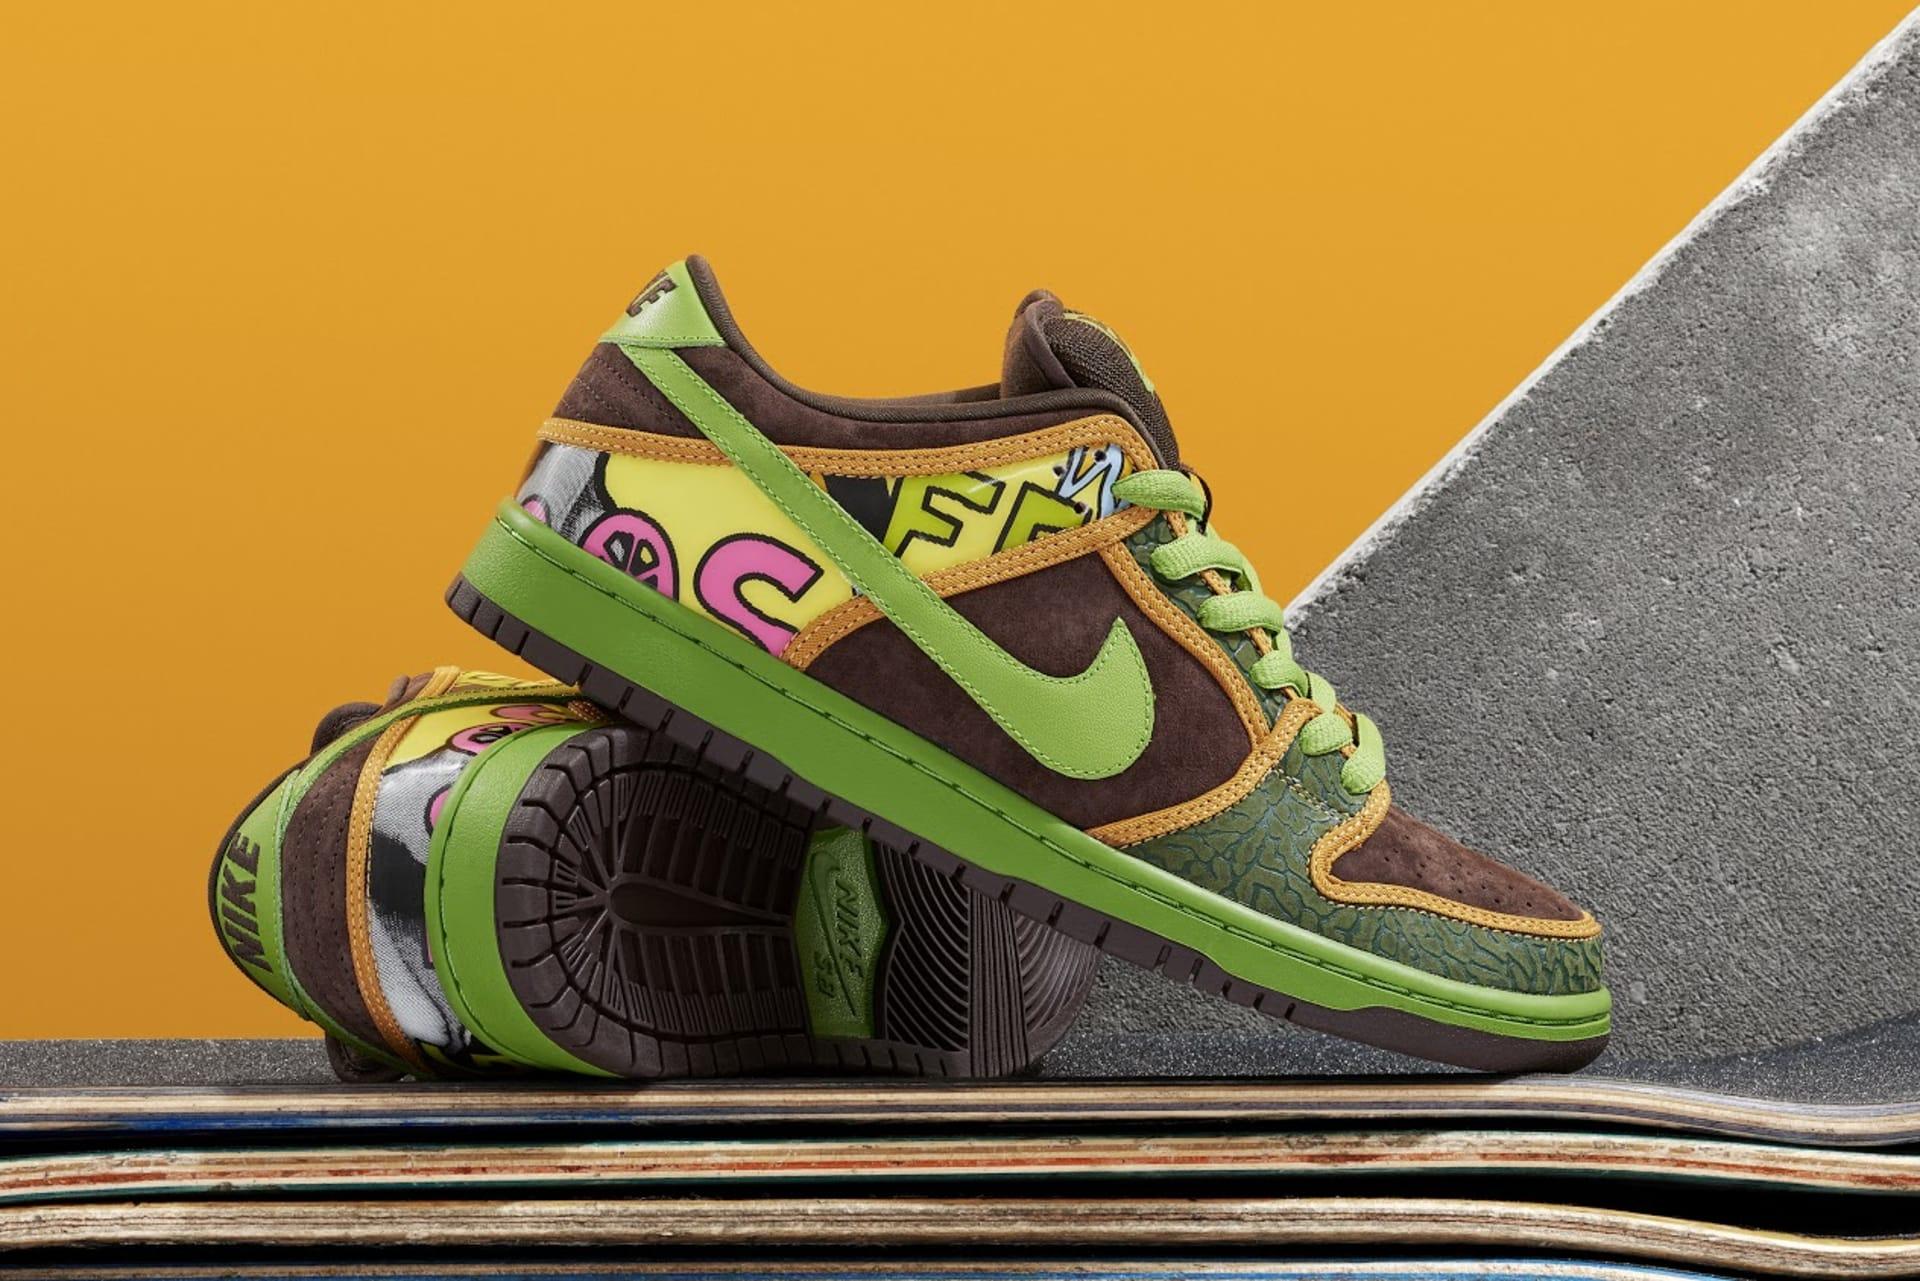 best loved cf9e4 267dd Exclusive: The Nike Dunk SB 'De La Soul' Is Back 2015 | Complex